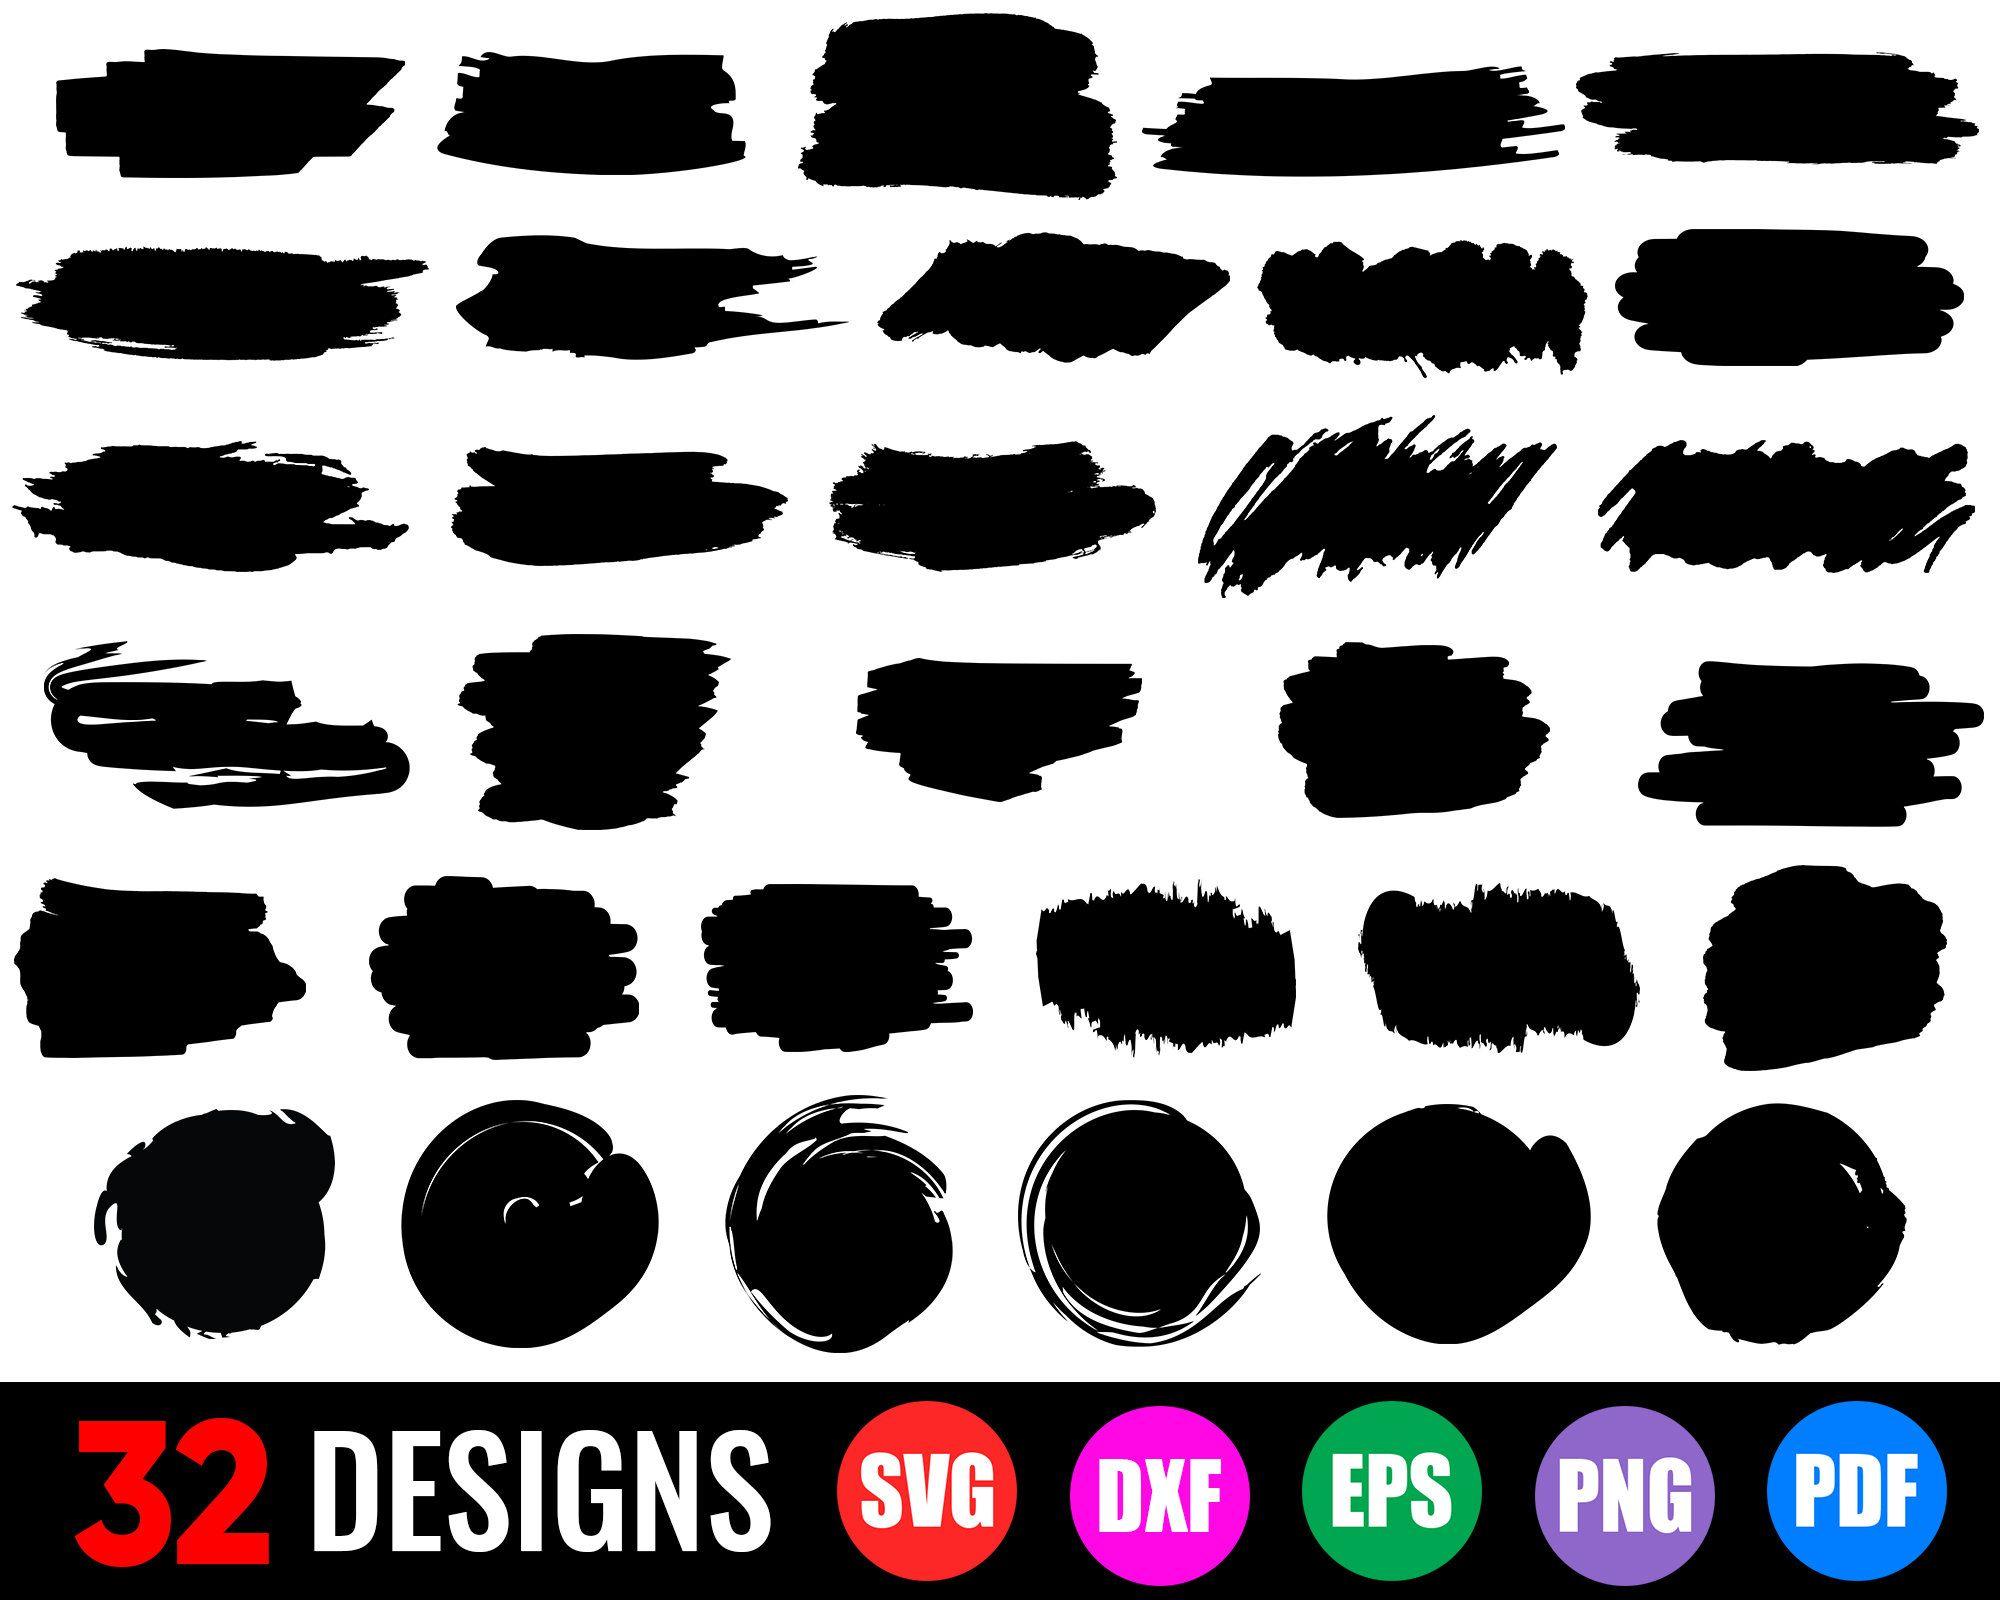 Paint Brush Stroke Svg Paint Brush Svg Paint Stroke Svg Brush Stroke Clipart Brush Stroke Vector Paint Brushes Svg Paint Line Svg In 2021 Paint Splash Background Svg Background Patterns